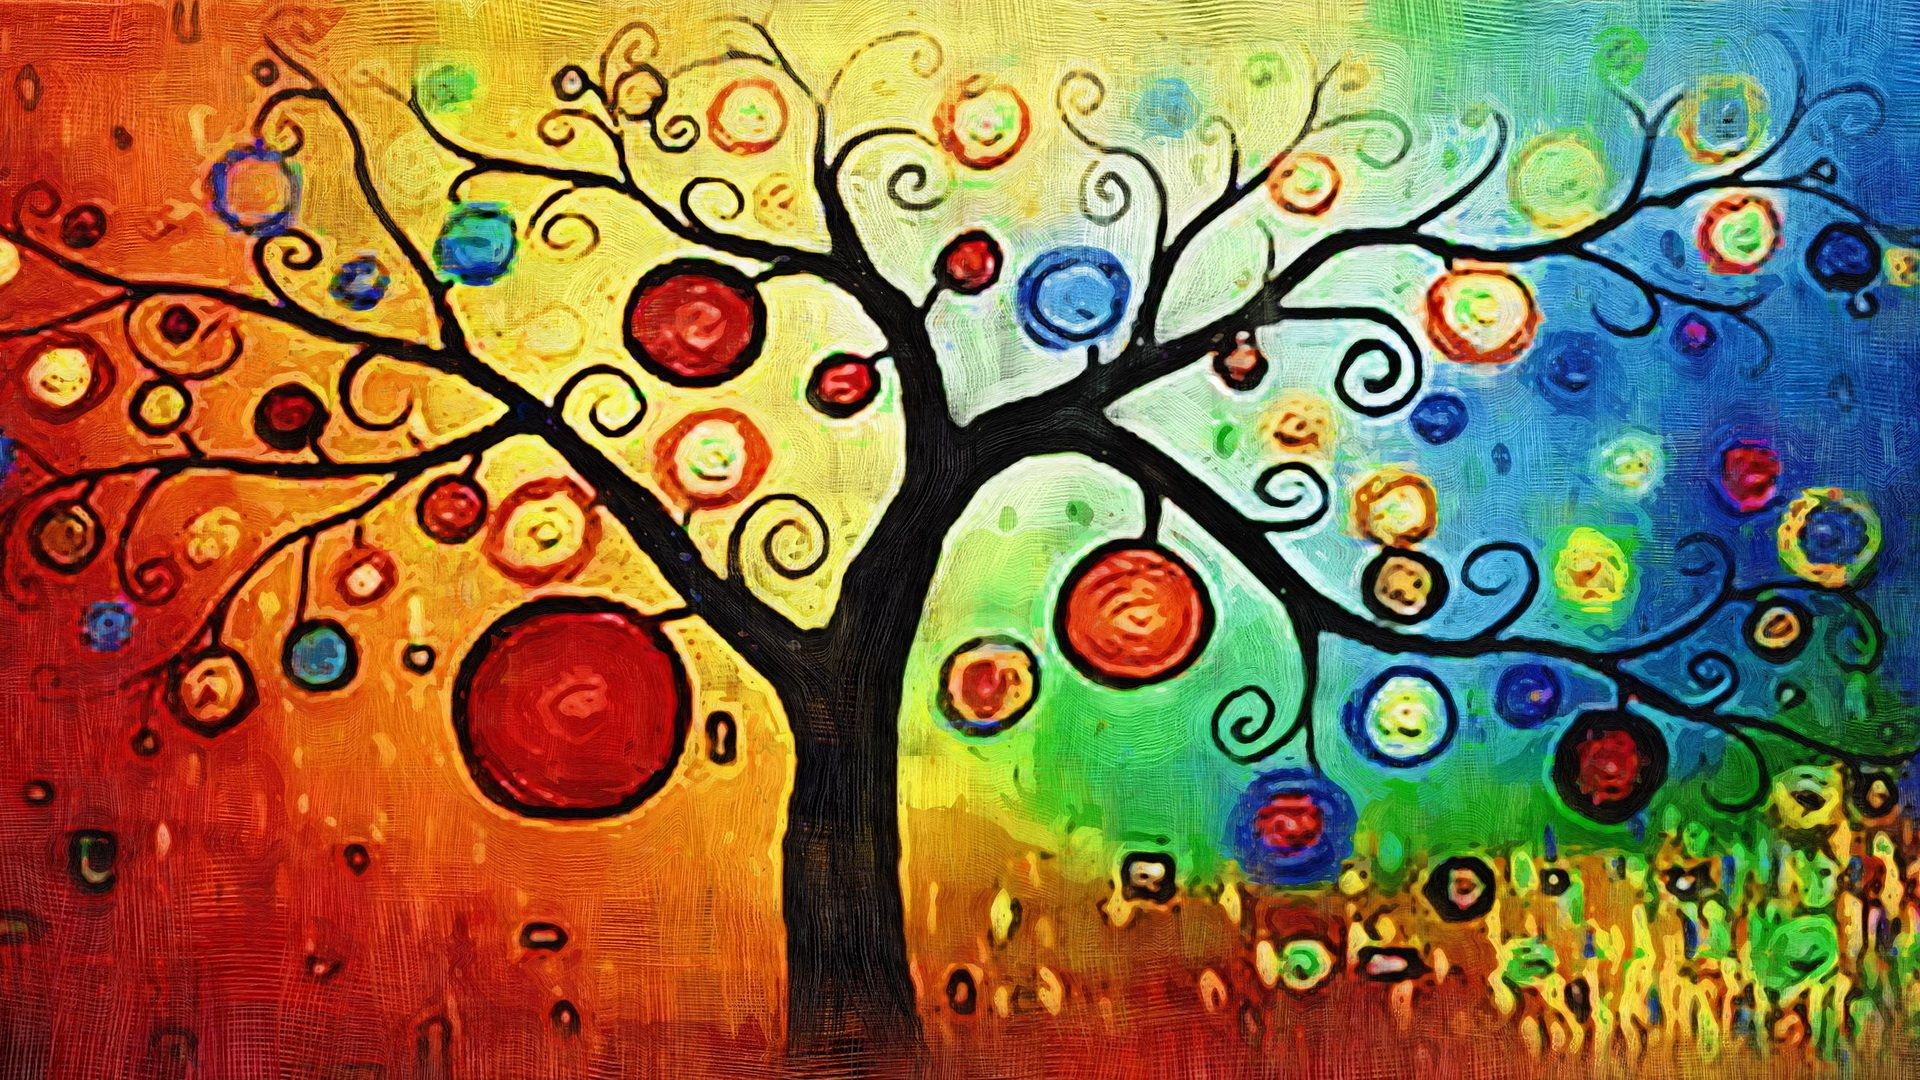 art painting wallpaper free download